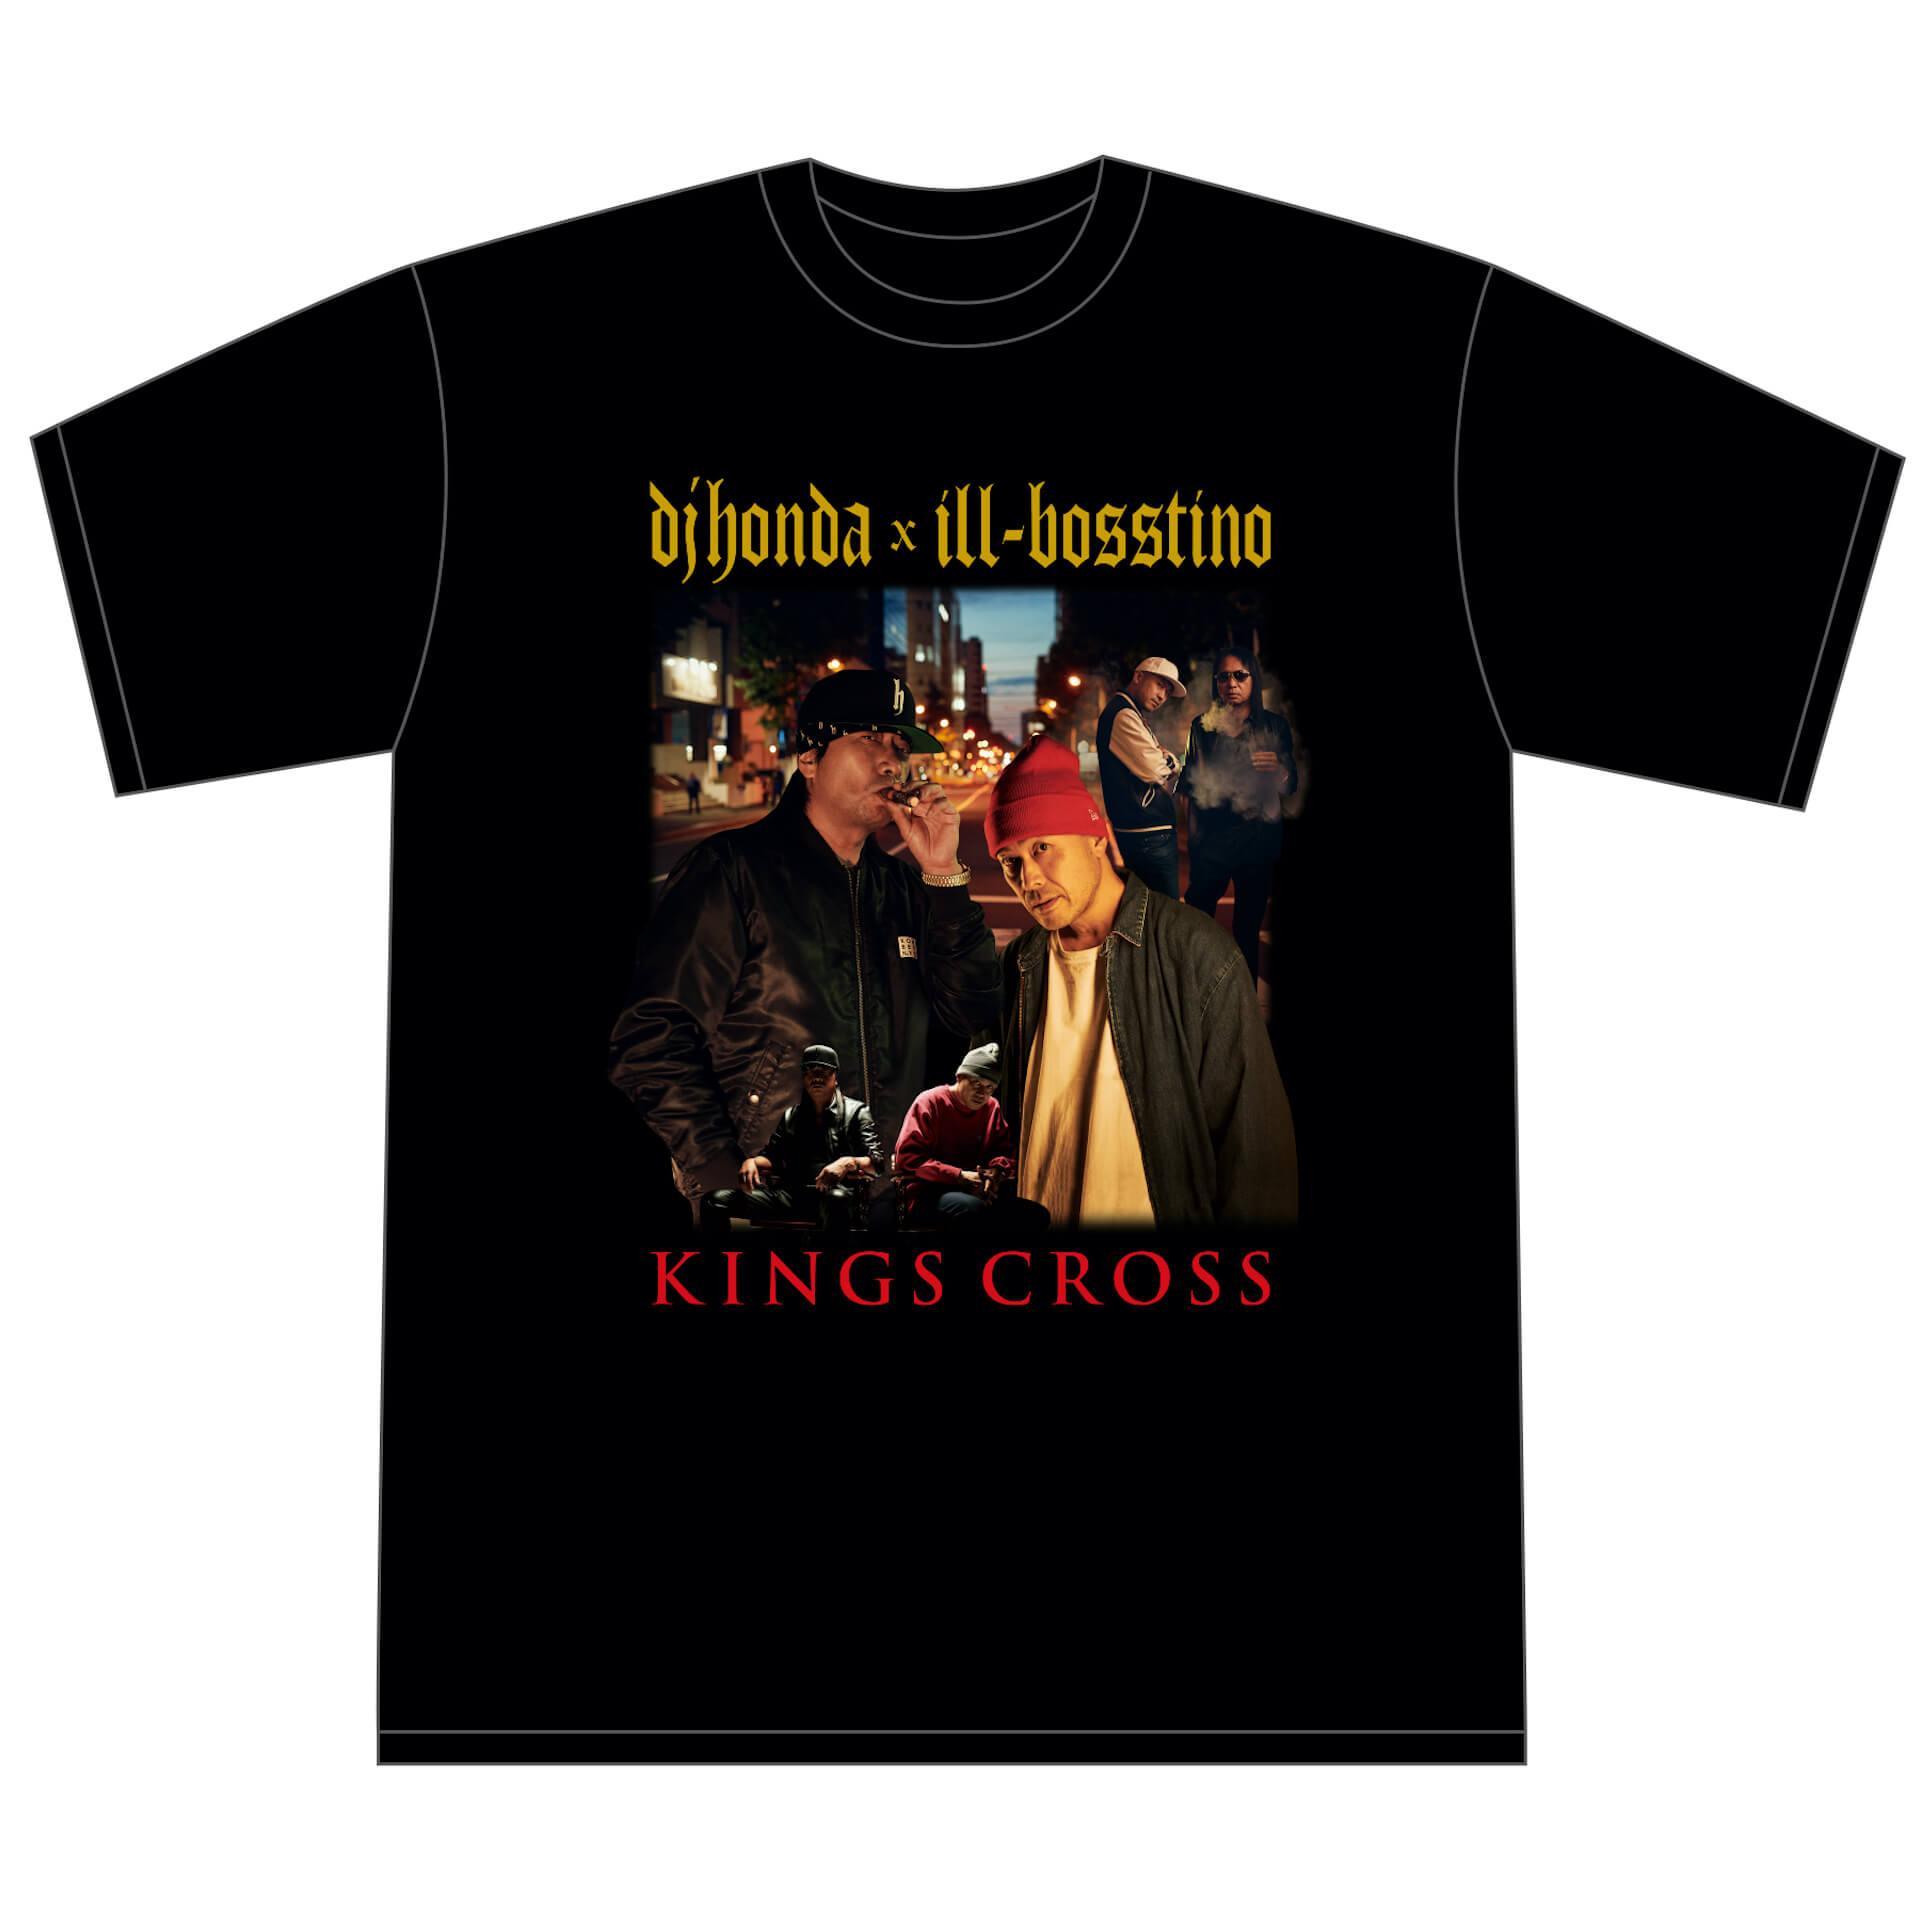 ILL-BOSSTINOとdj hondaによるアルバム『KINGS CROSS』から先行7インチがリリース決定! music210917_illbosstino_02